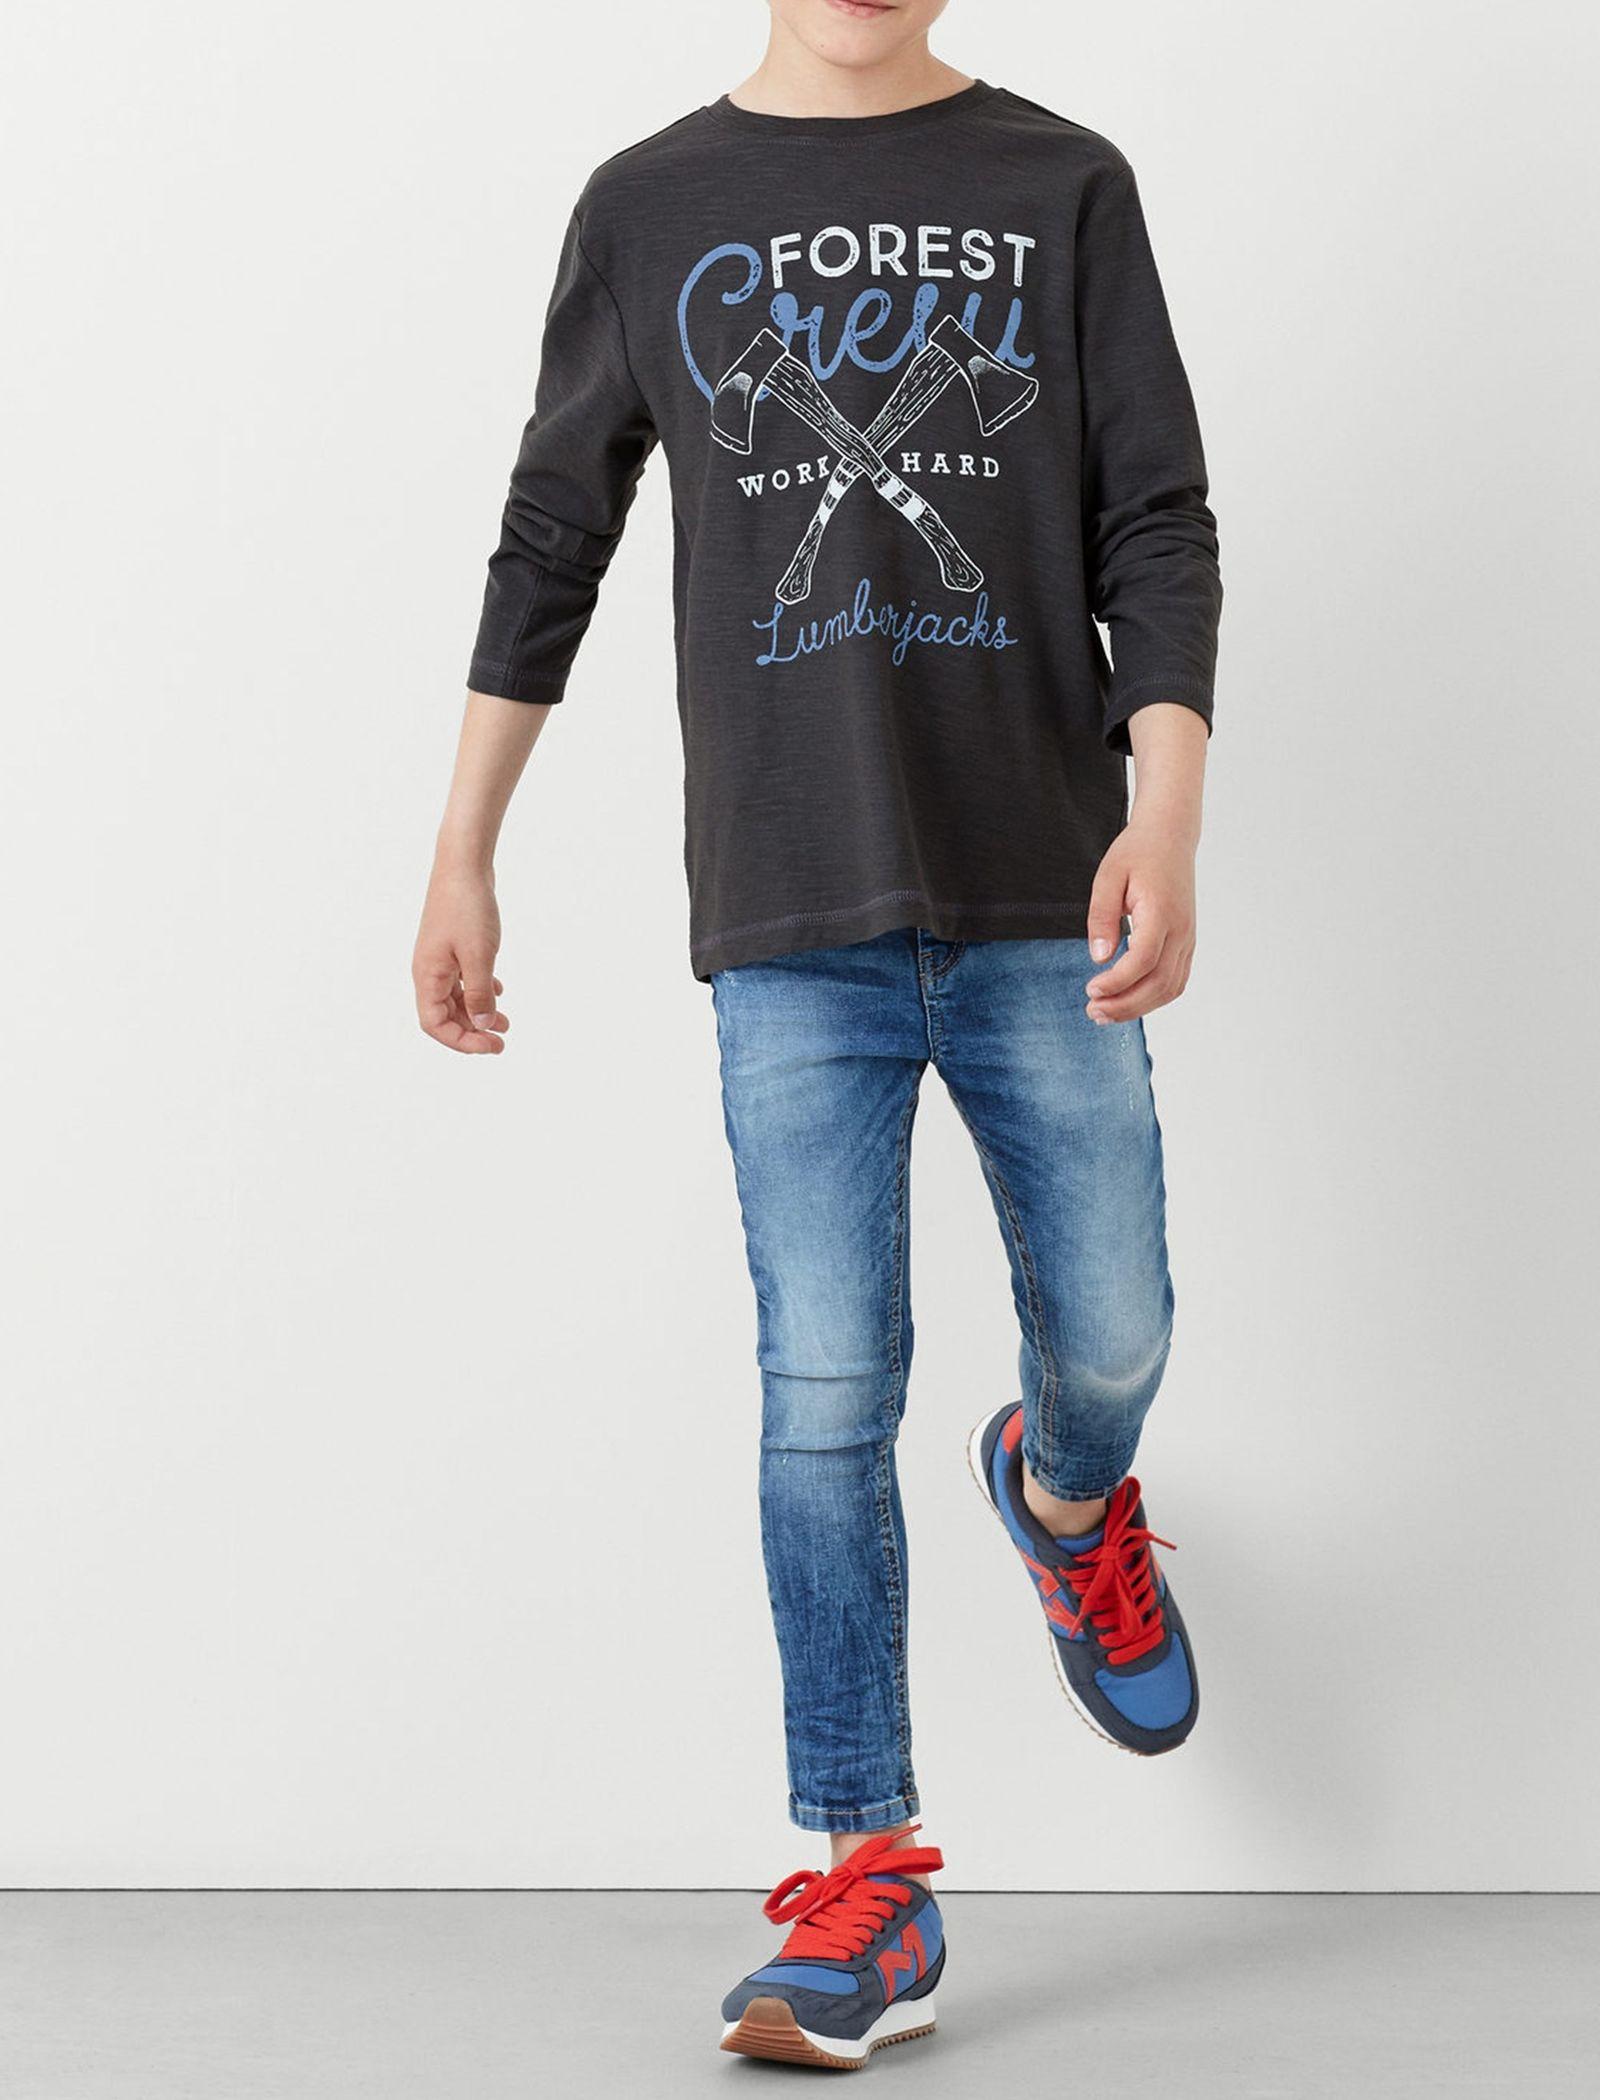 تی شرت نخی پسرانه - مانگو - طوسي تيره - 4